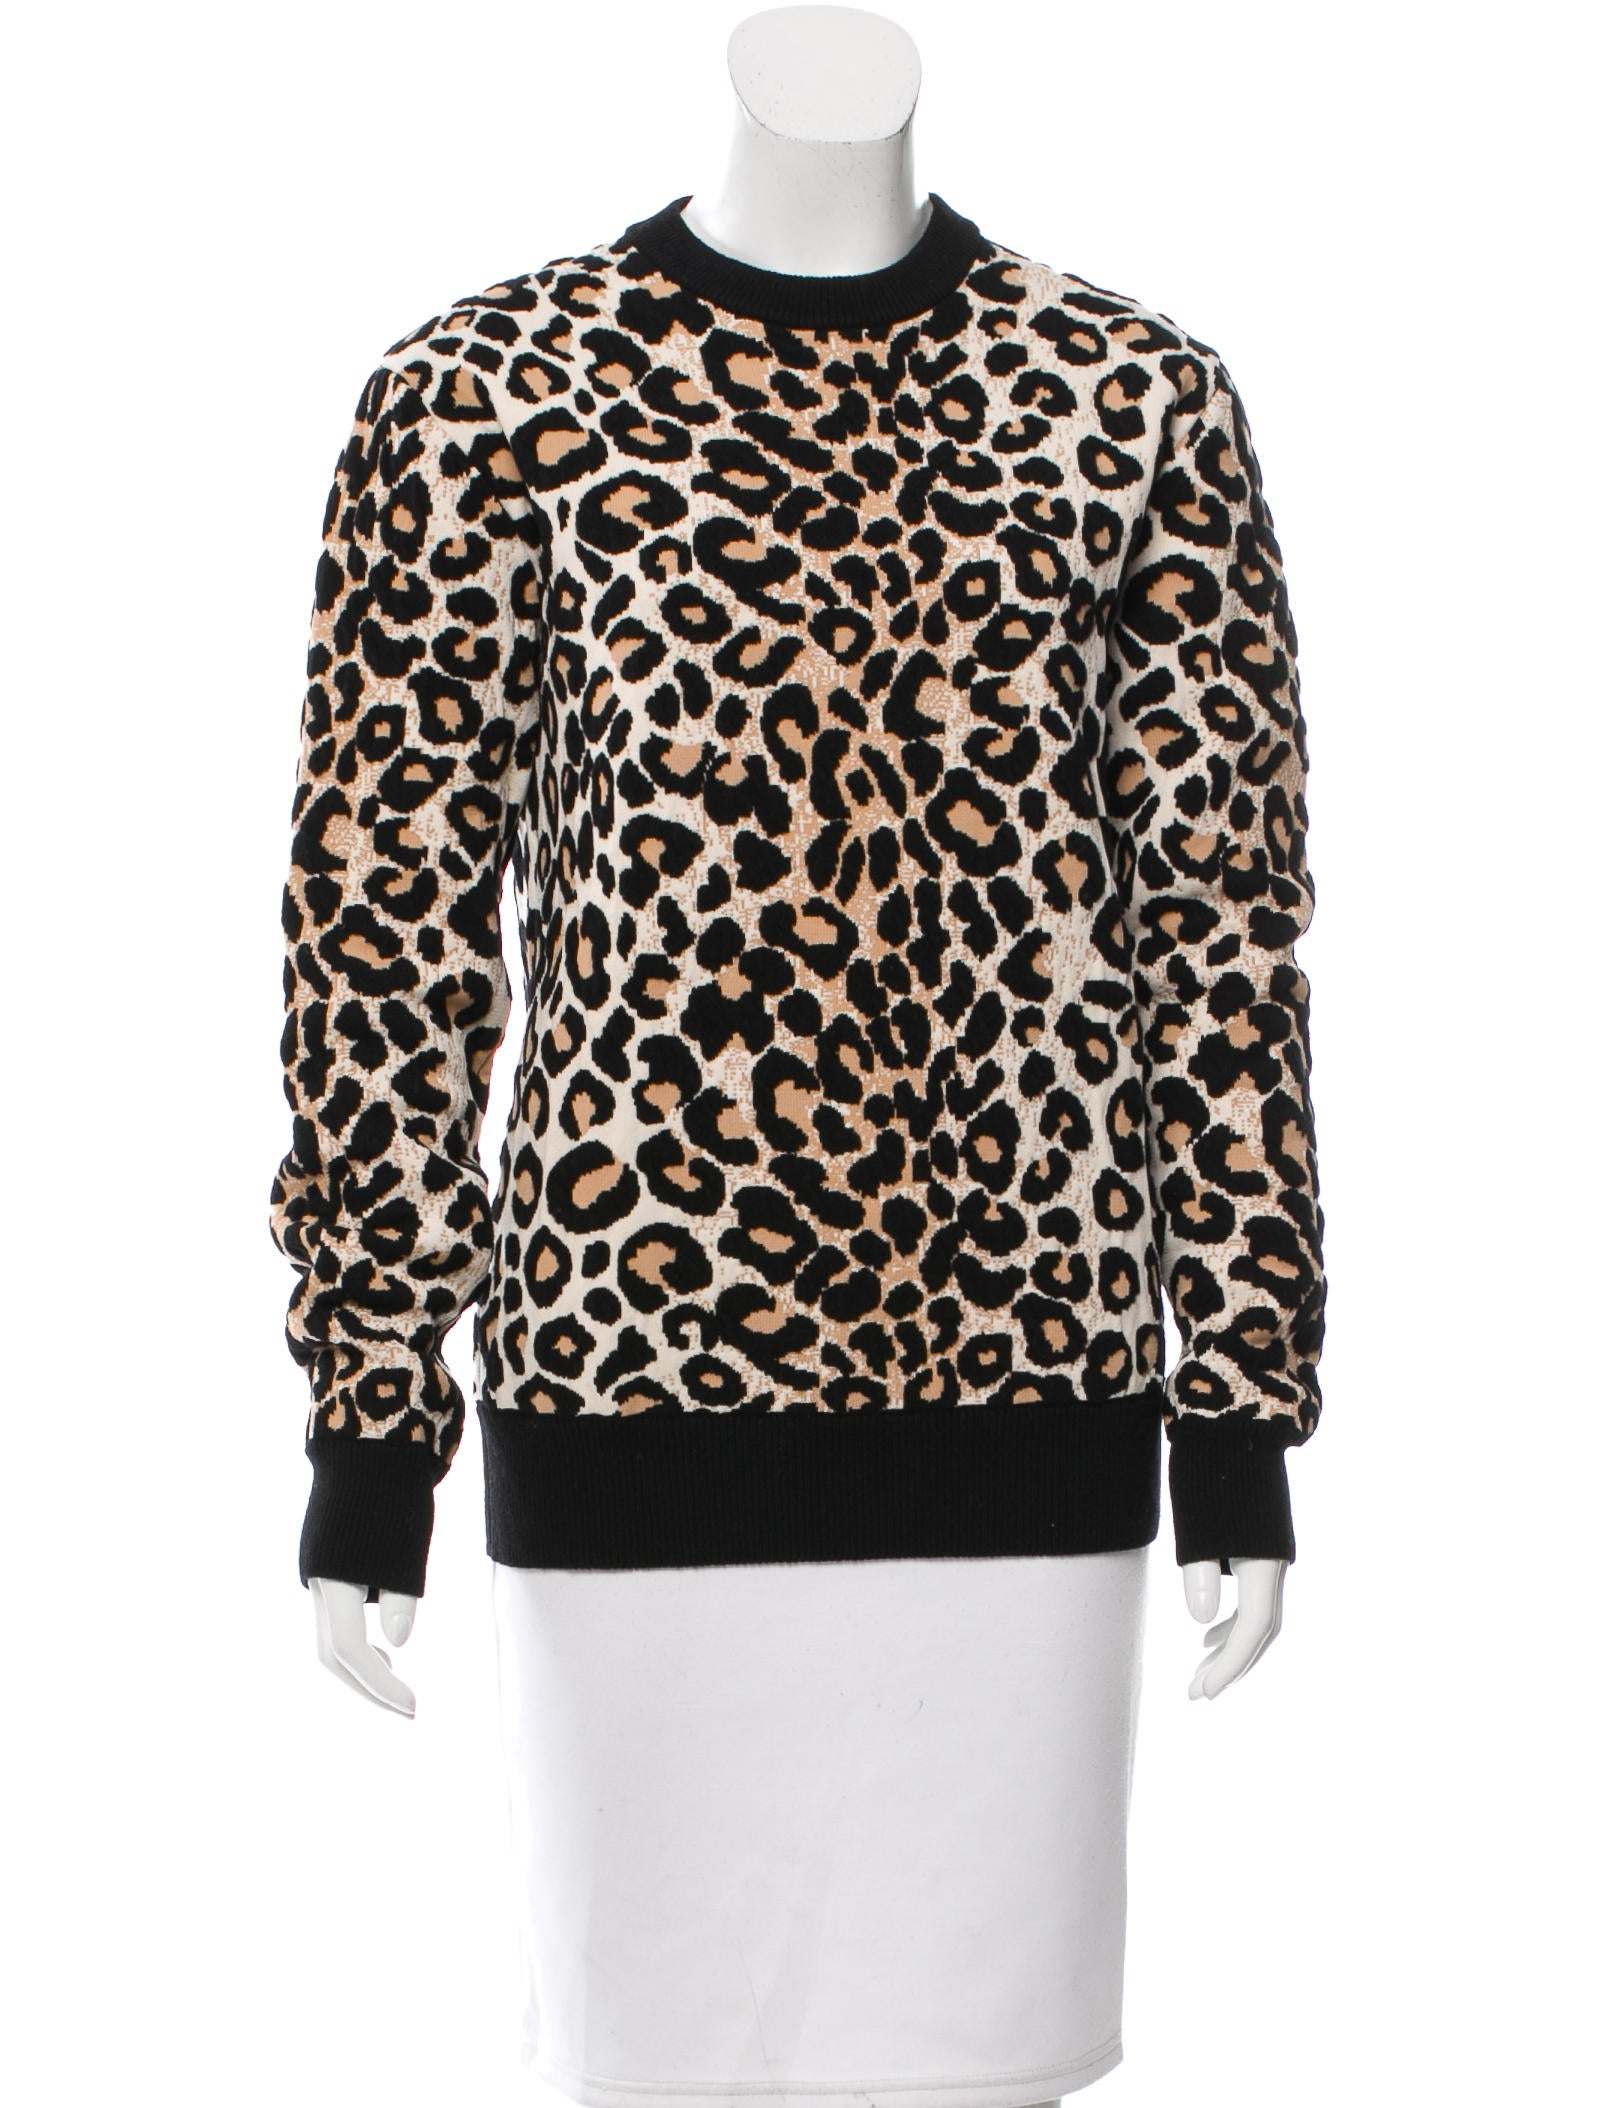 Céline Leopard Jacquard Sweater - Clothing